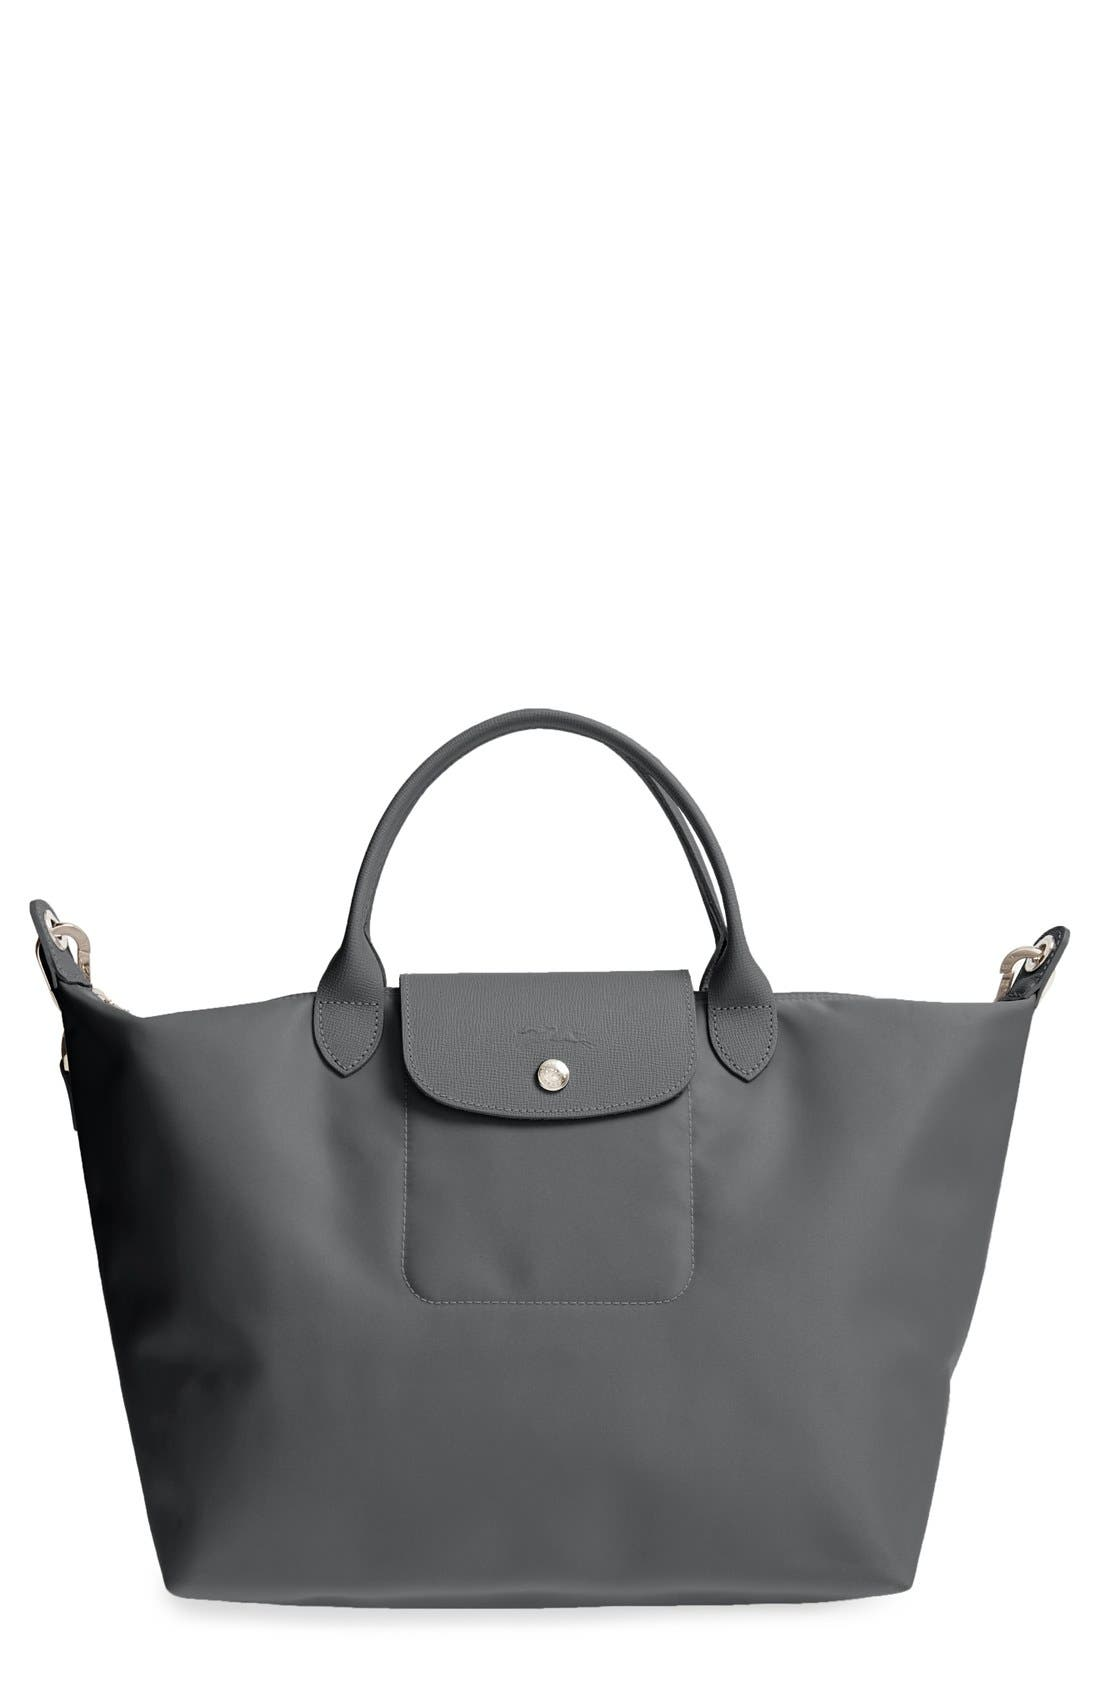 Longchamp 'Medium Le Pliage Neo' Nylon Tote